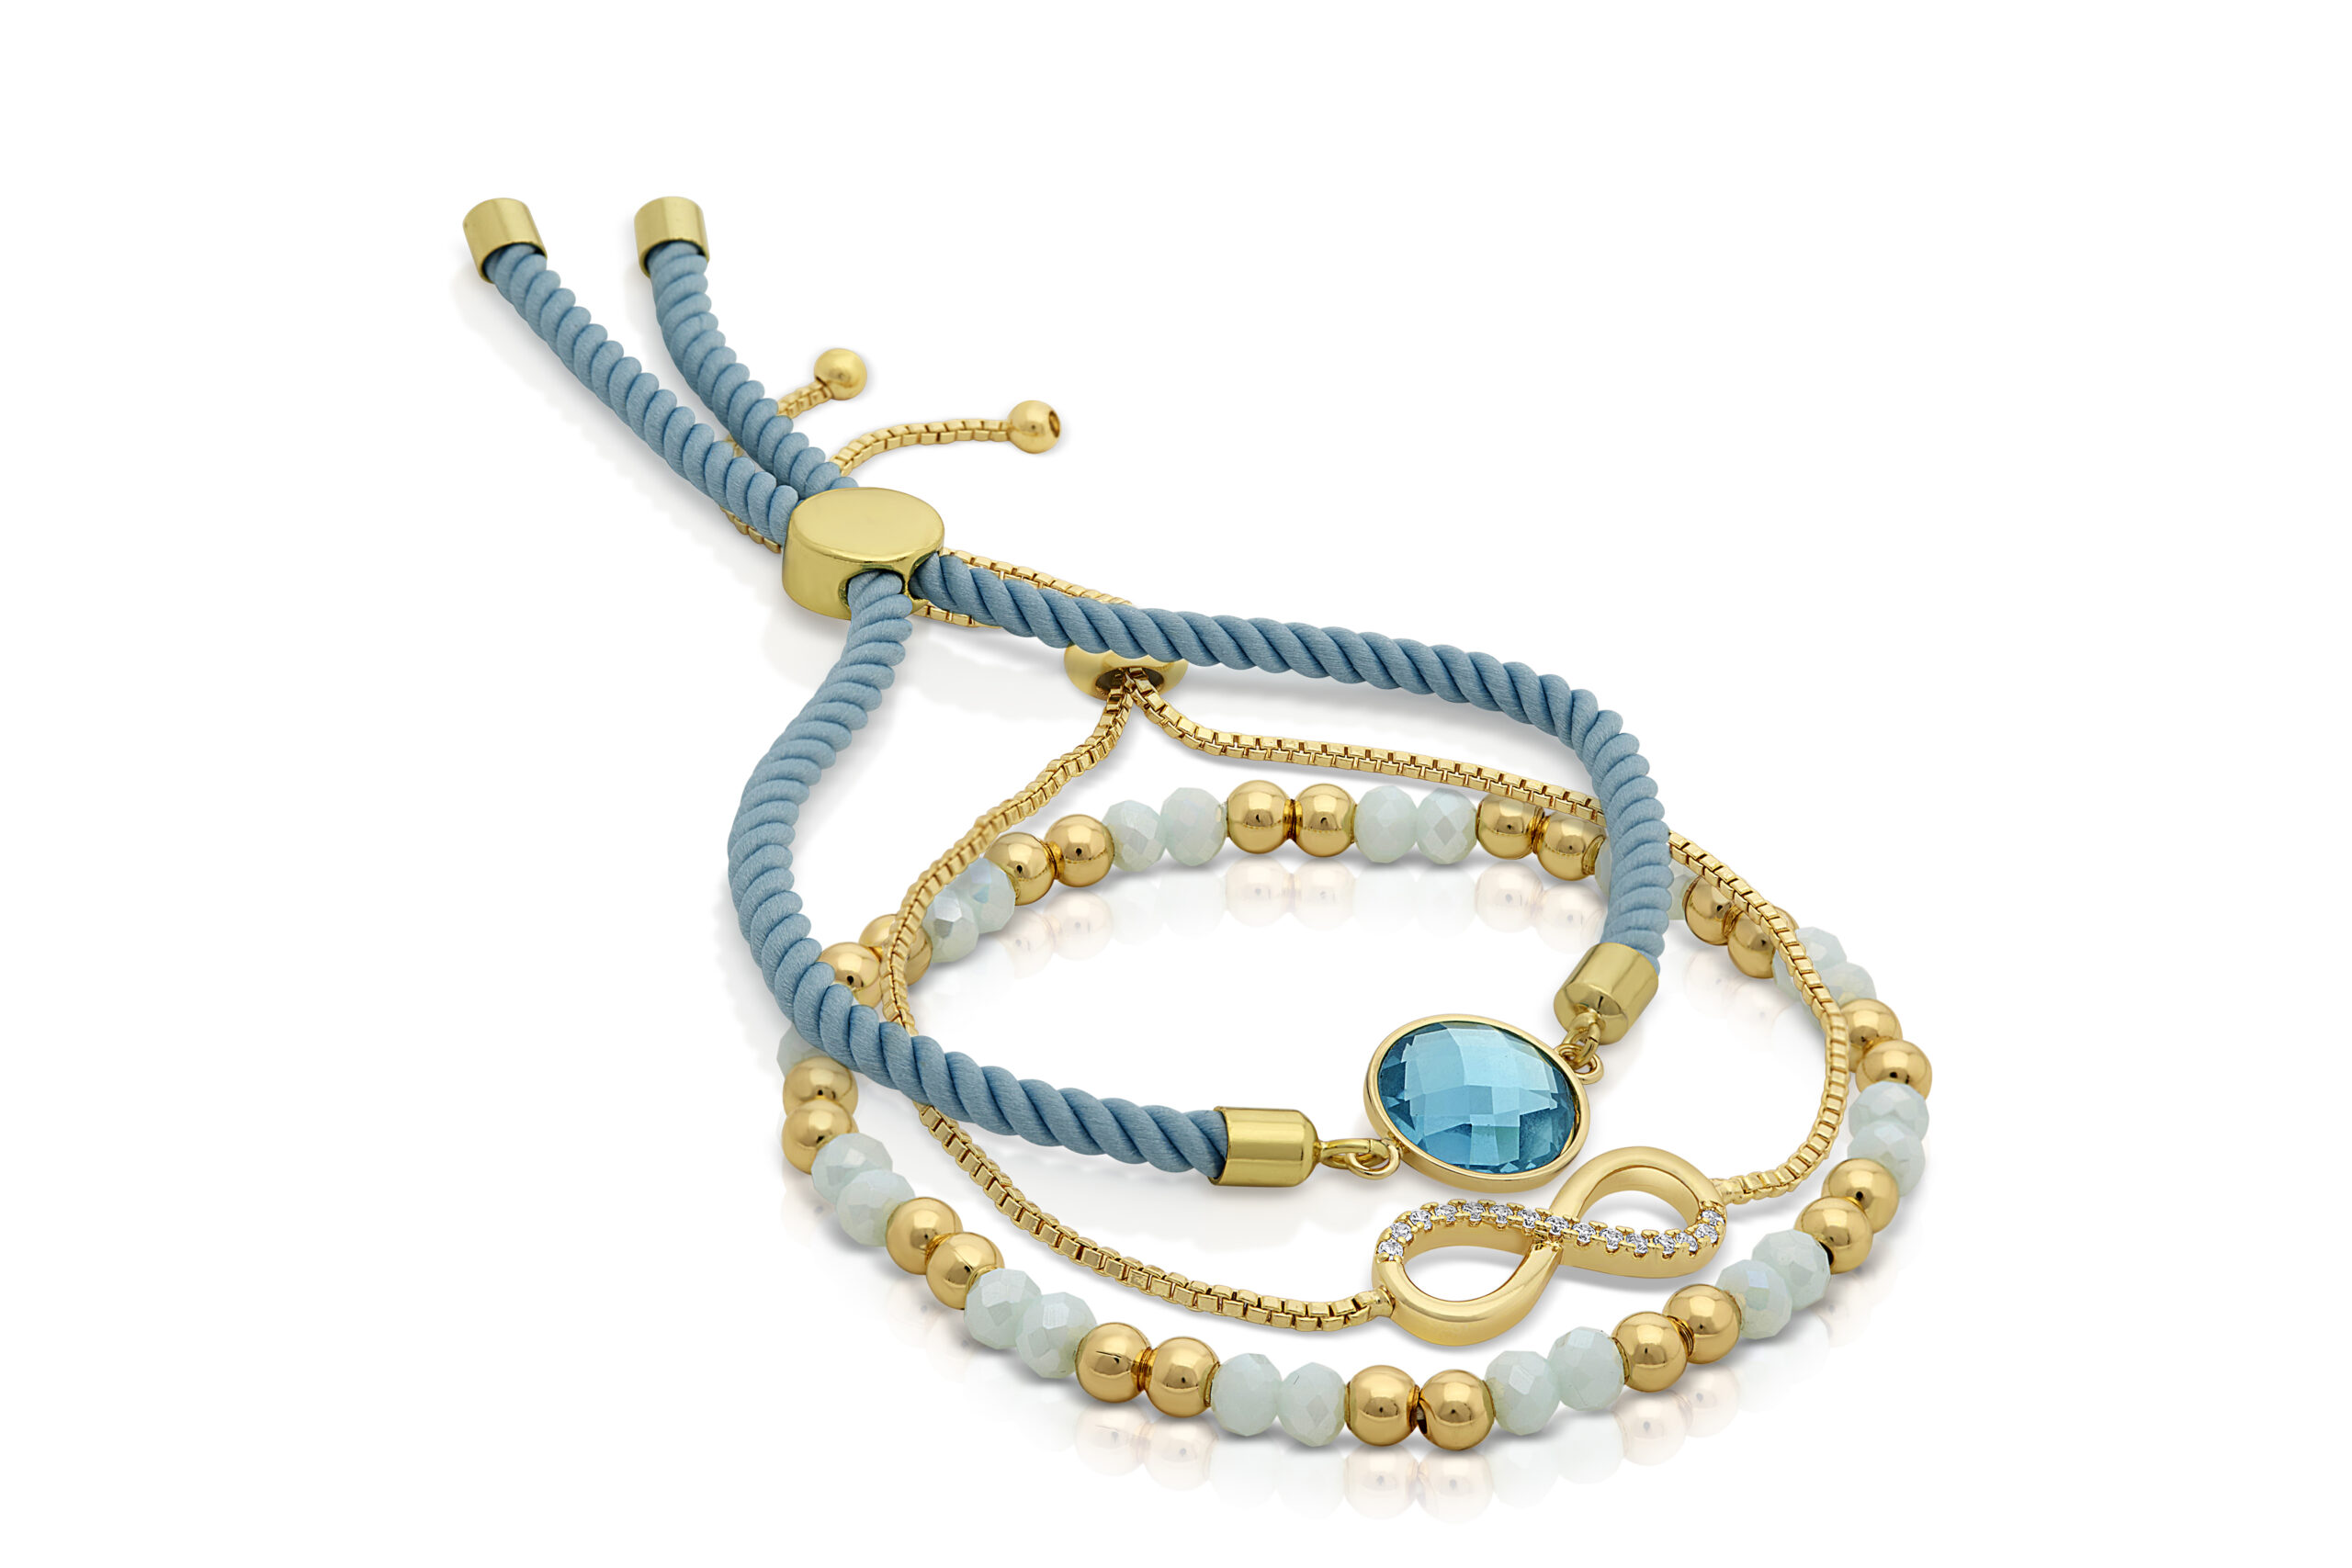 Turquoise Serenity Sky Bracelet Set